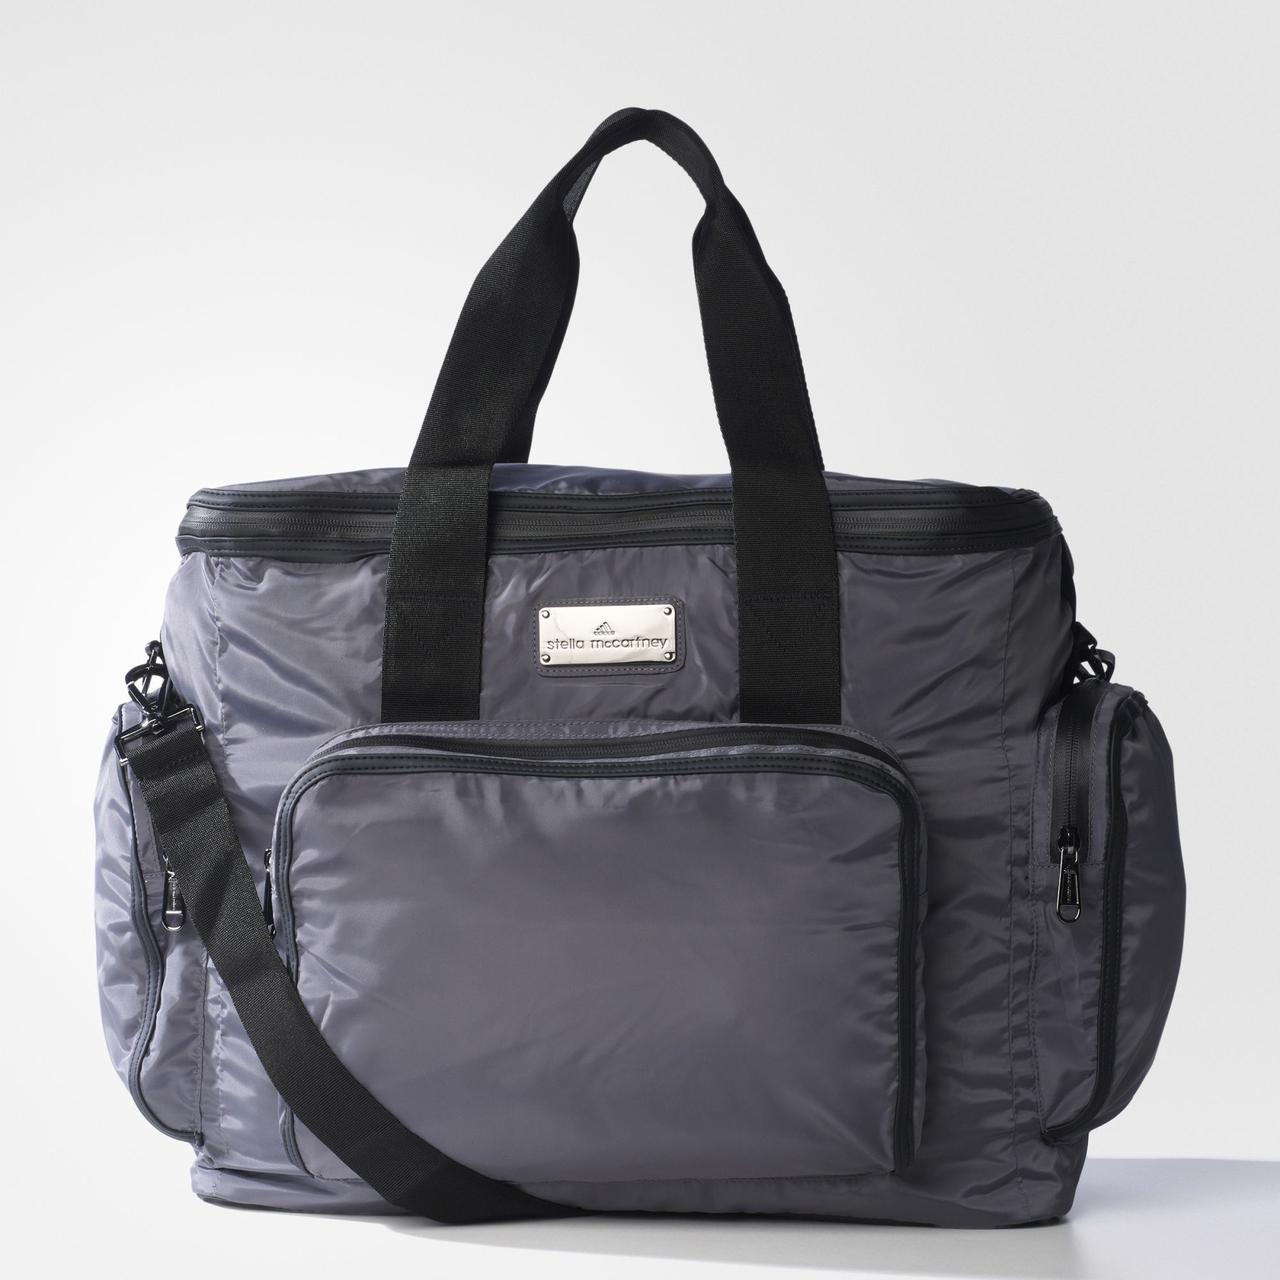 02704314478d Спортивная сумка Fashion Shape: продажа, цена в Харькове. Товары ...